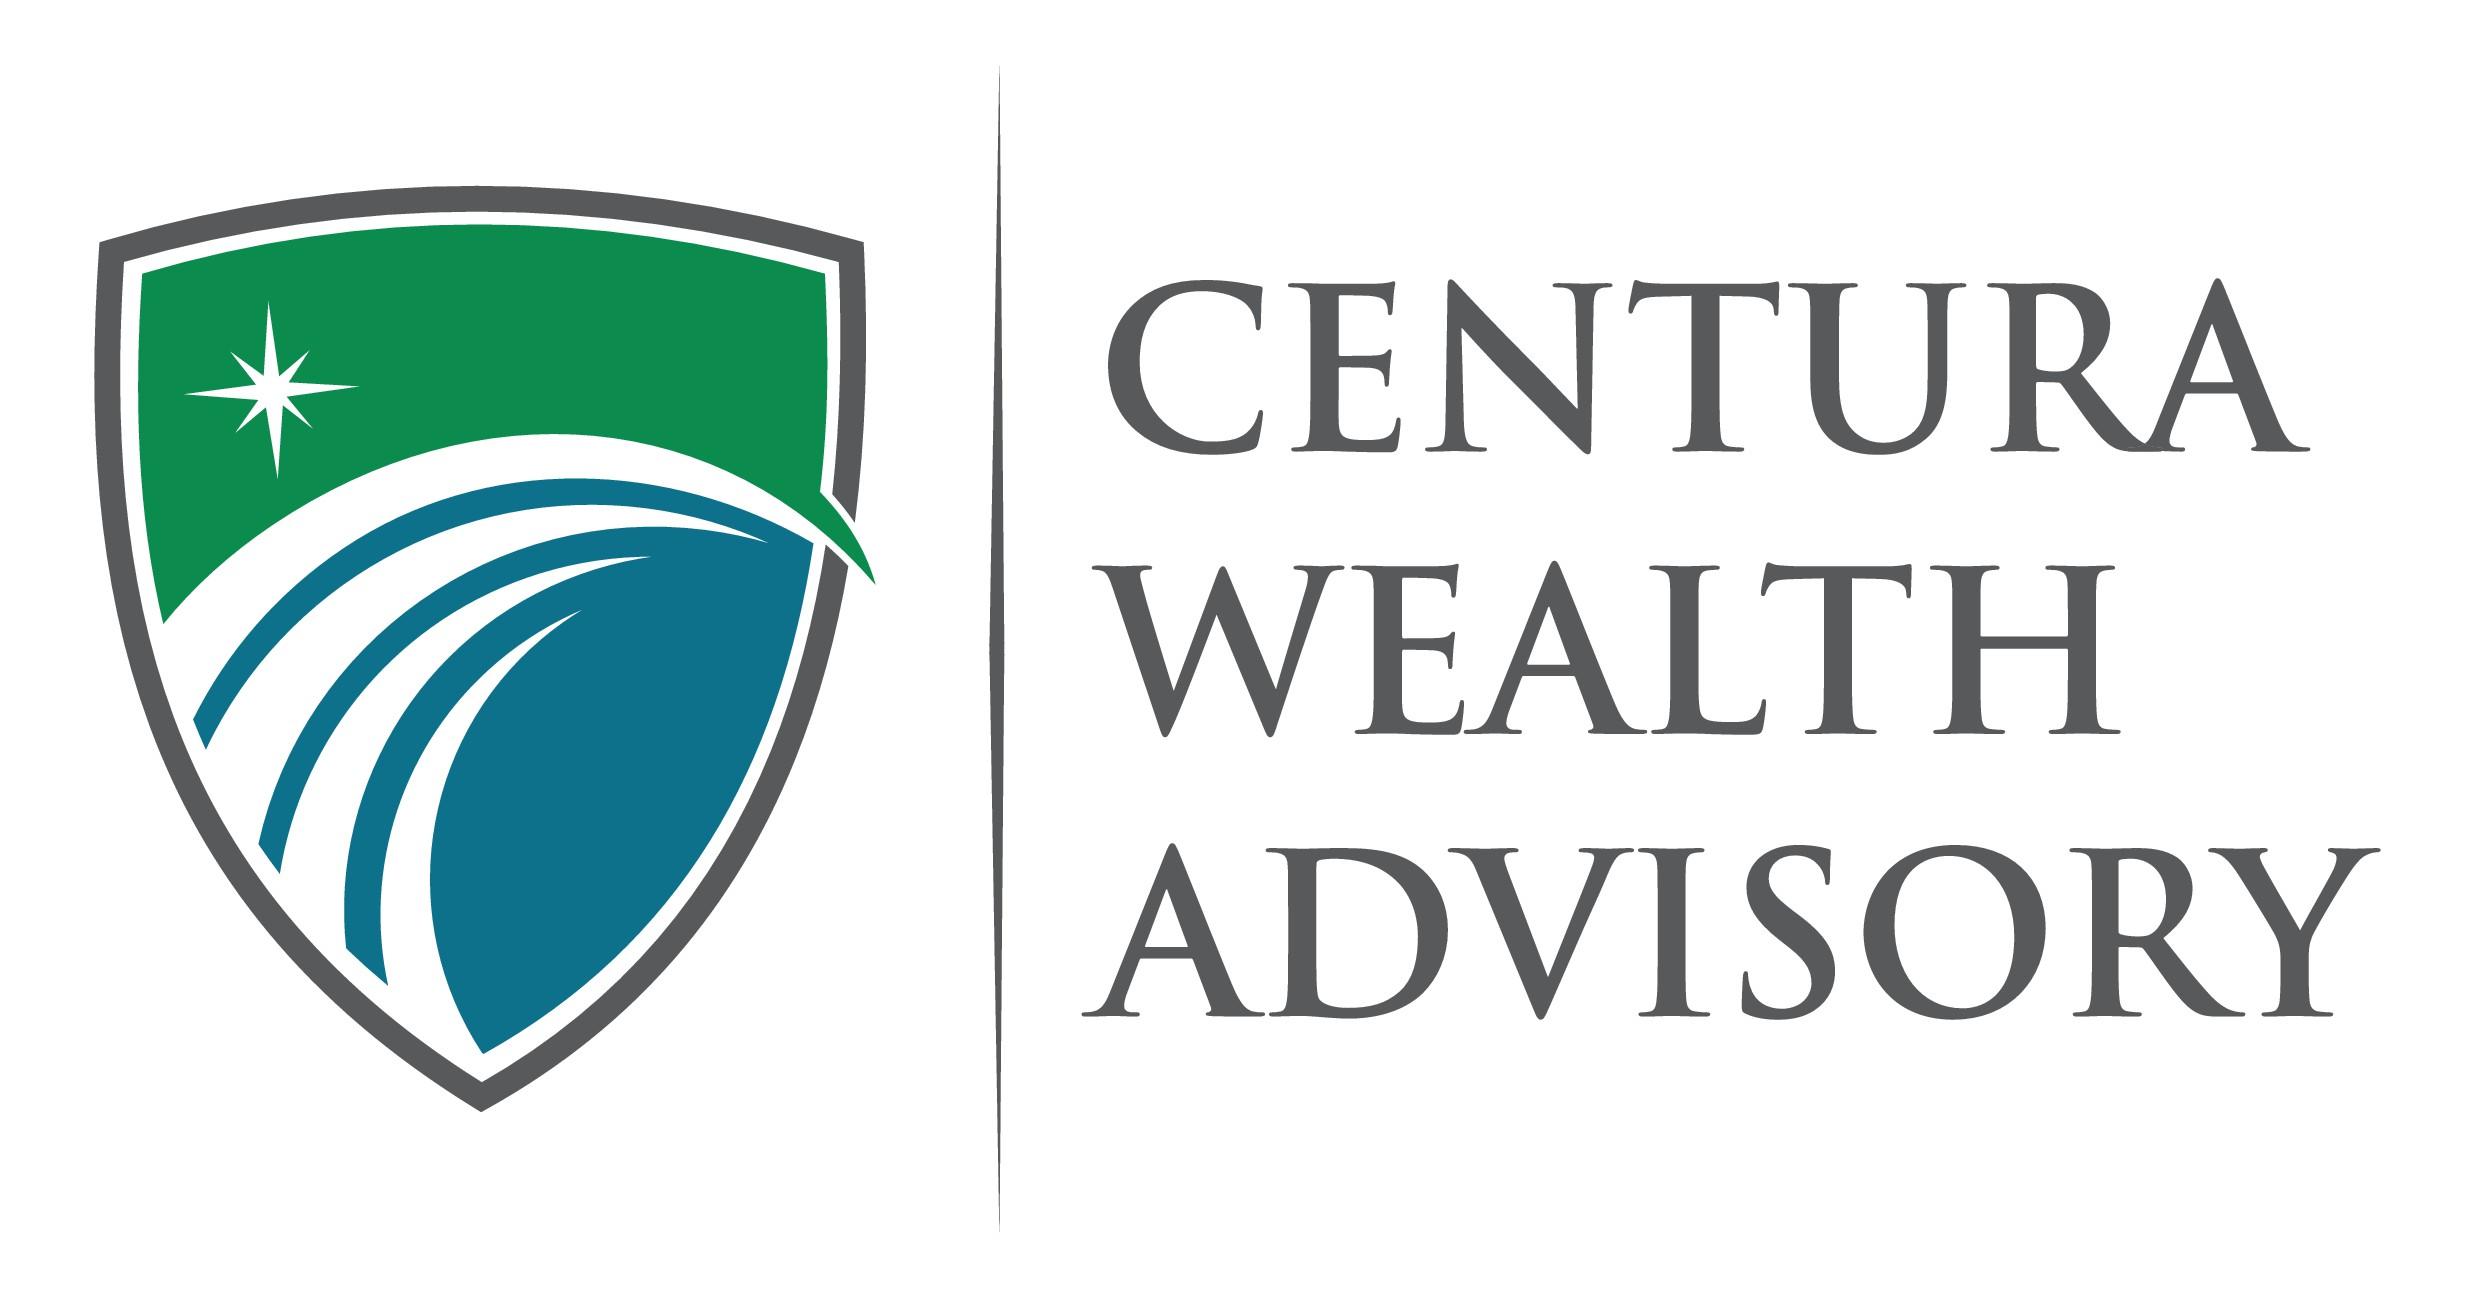 Wealth Management Firm Brand/Logo Identity serving high net worth clients